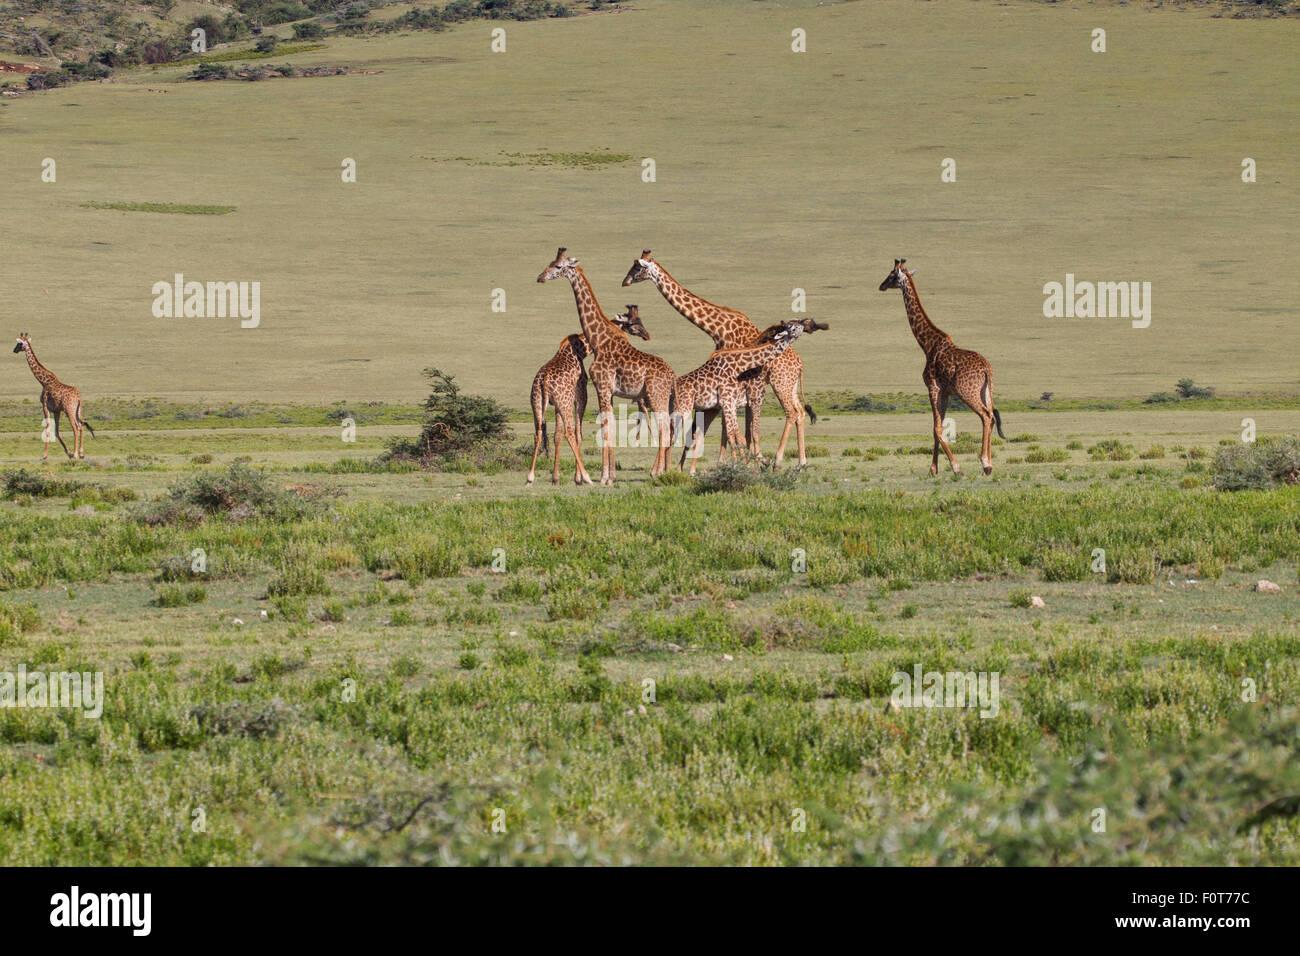 Plains or Masai Giraffes, Tanzania - Stock Image